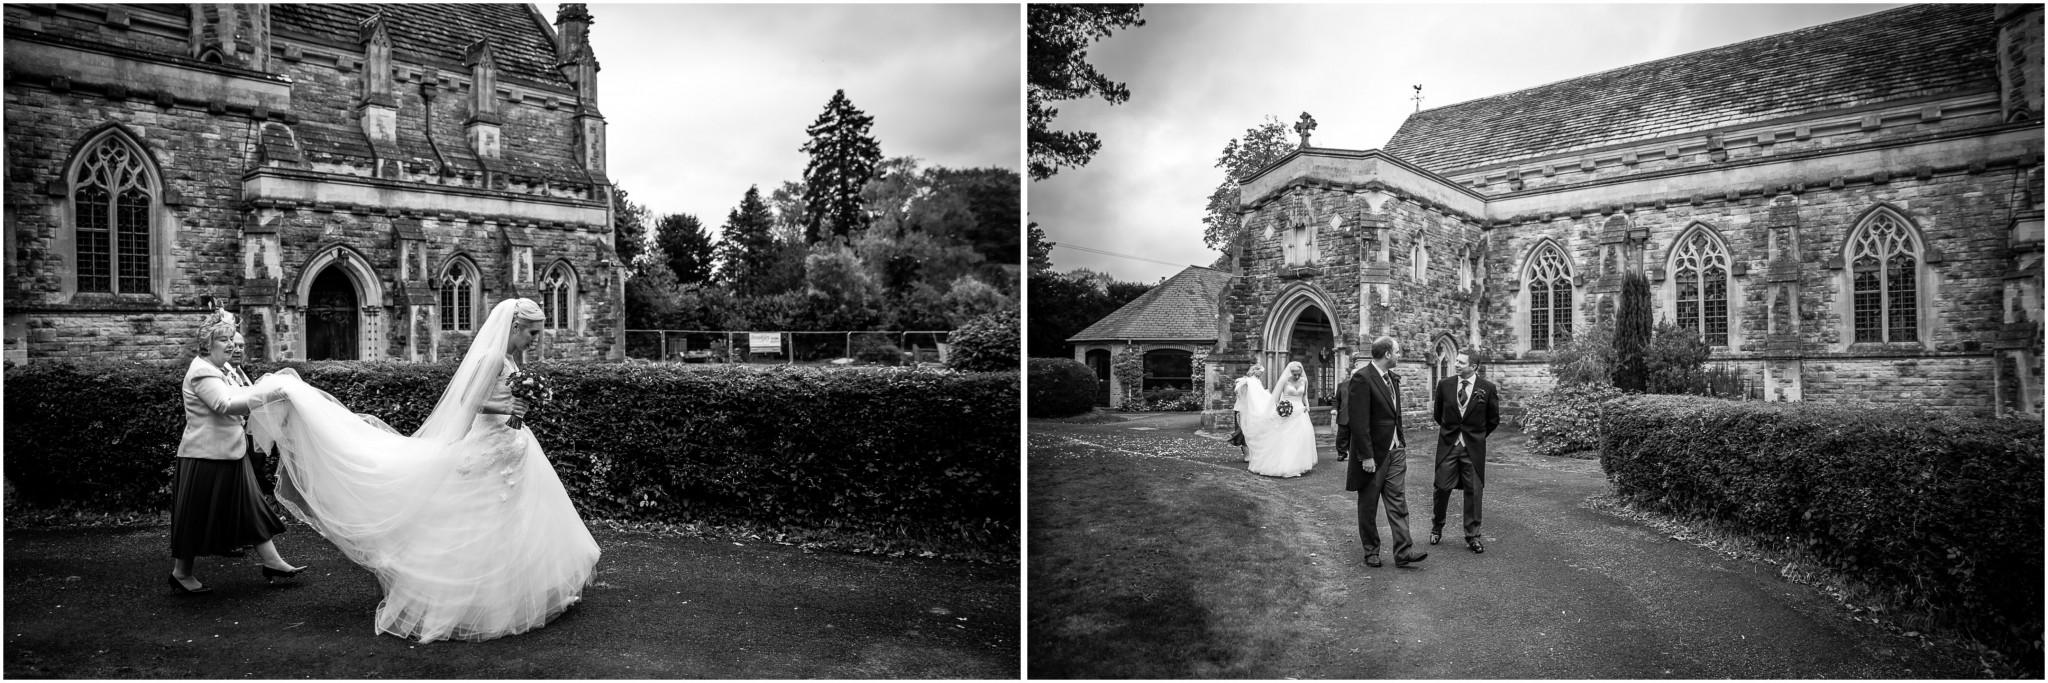 St Saviours Church Brockenhurst Bride & Groom walk from the church